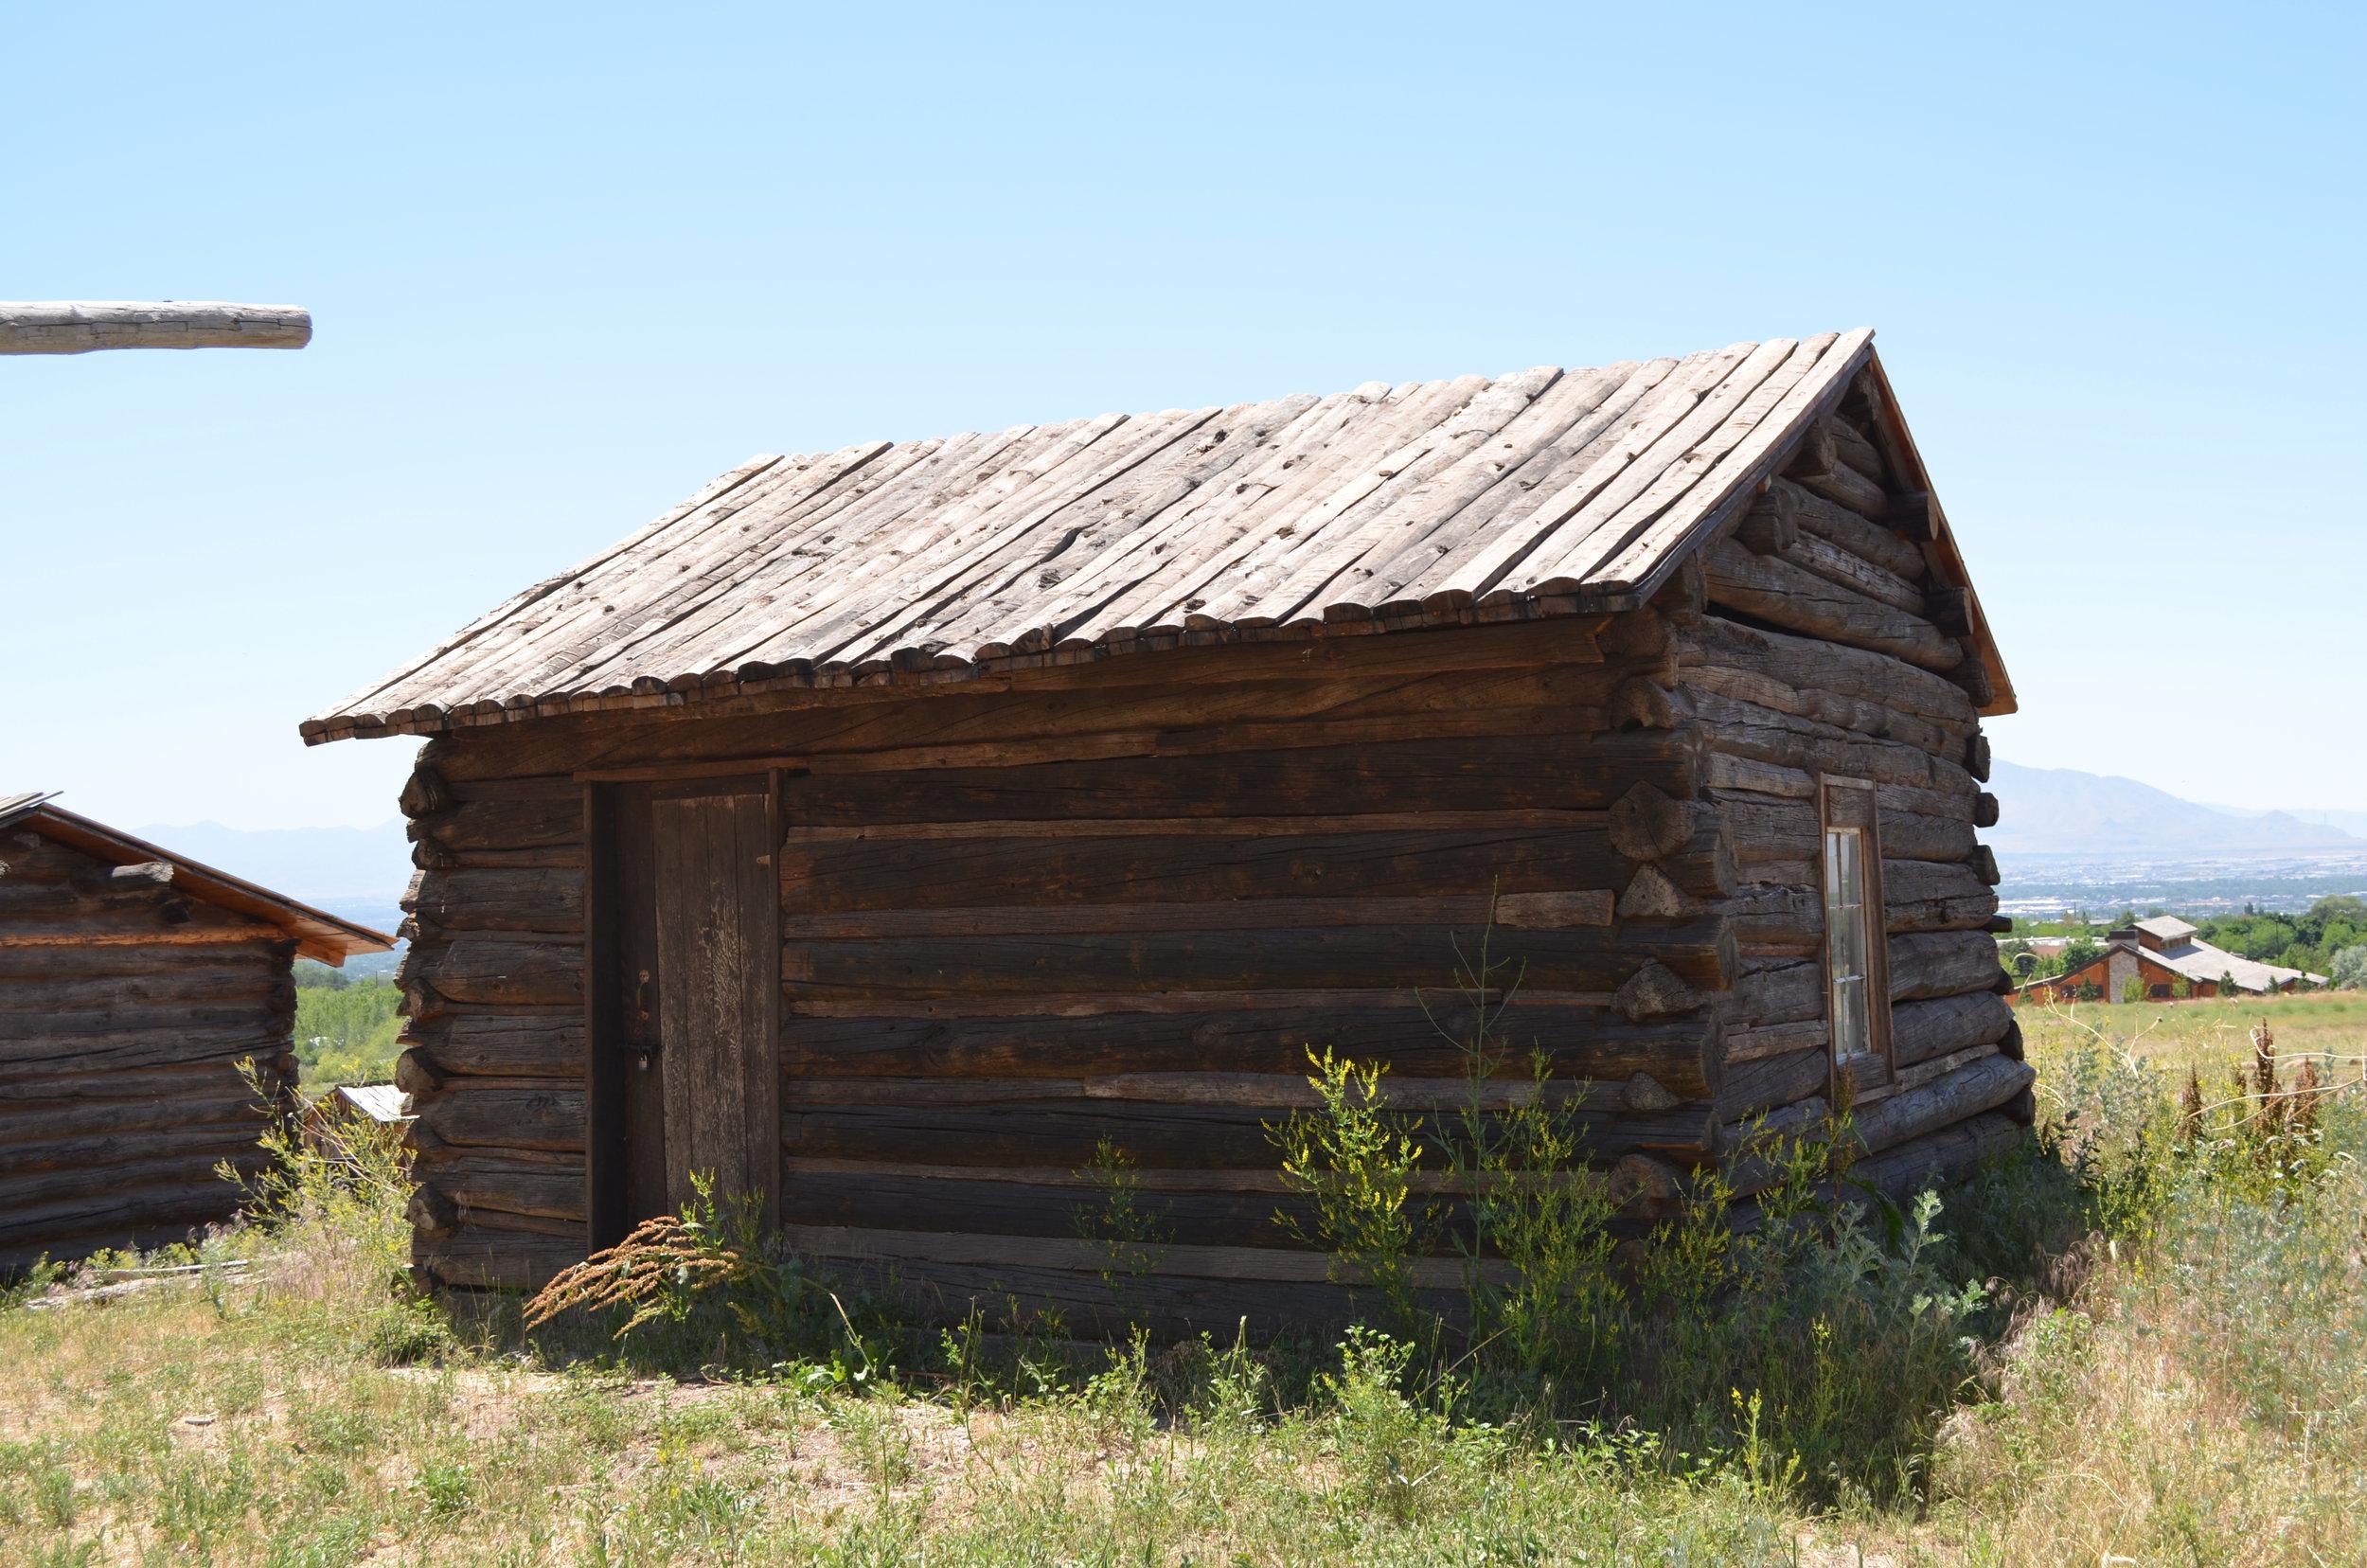 Woodmancy-Richardson Cabin